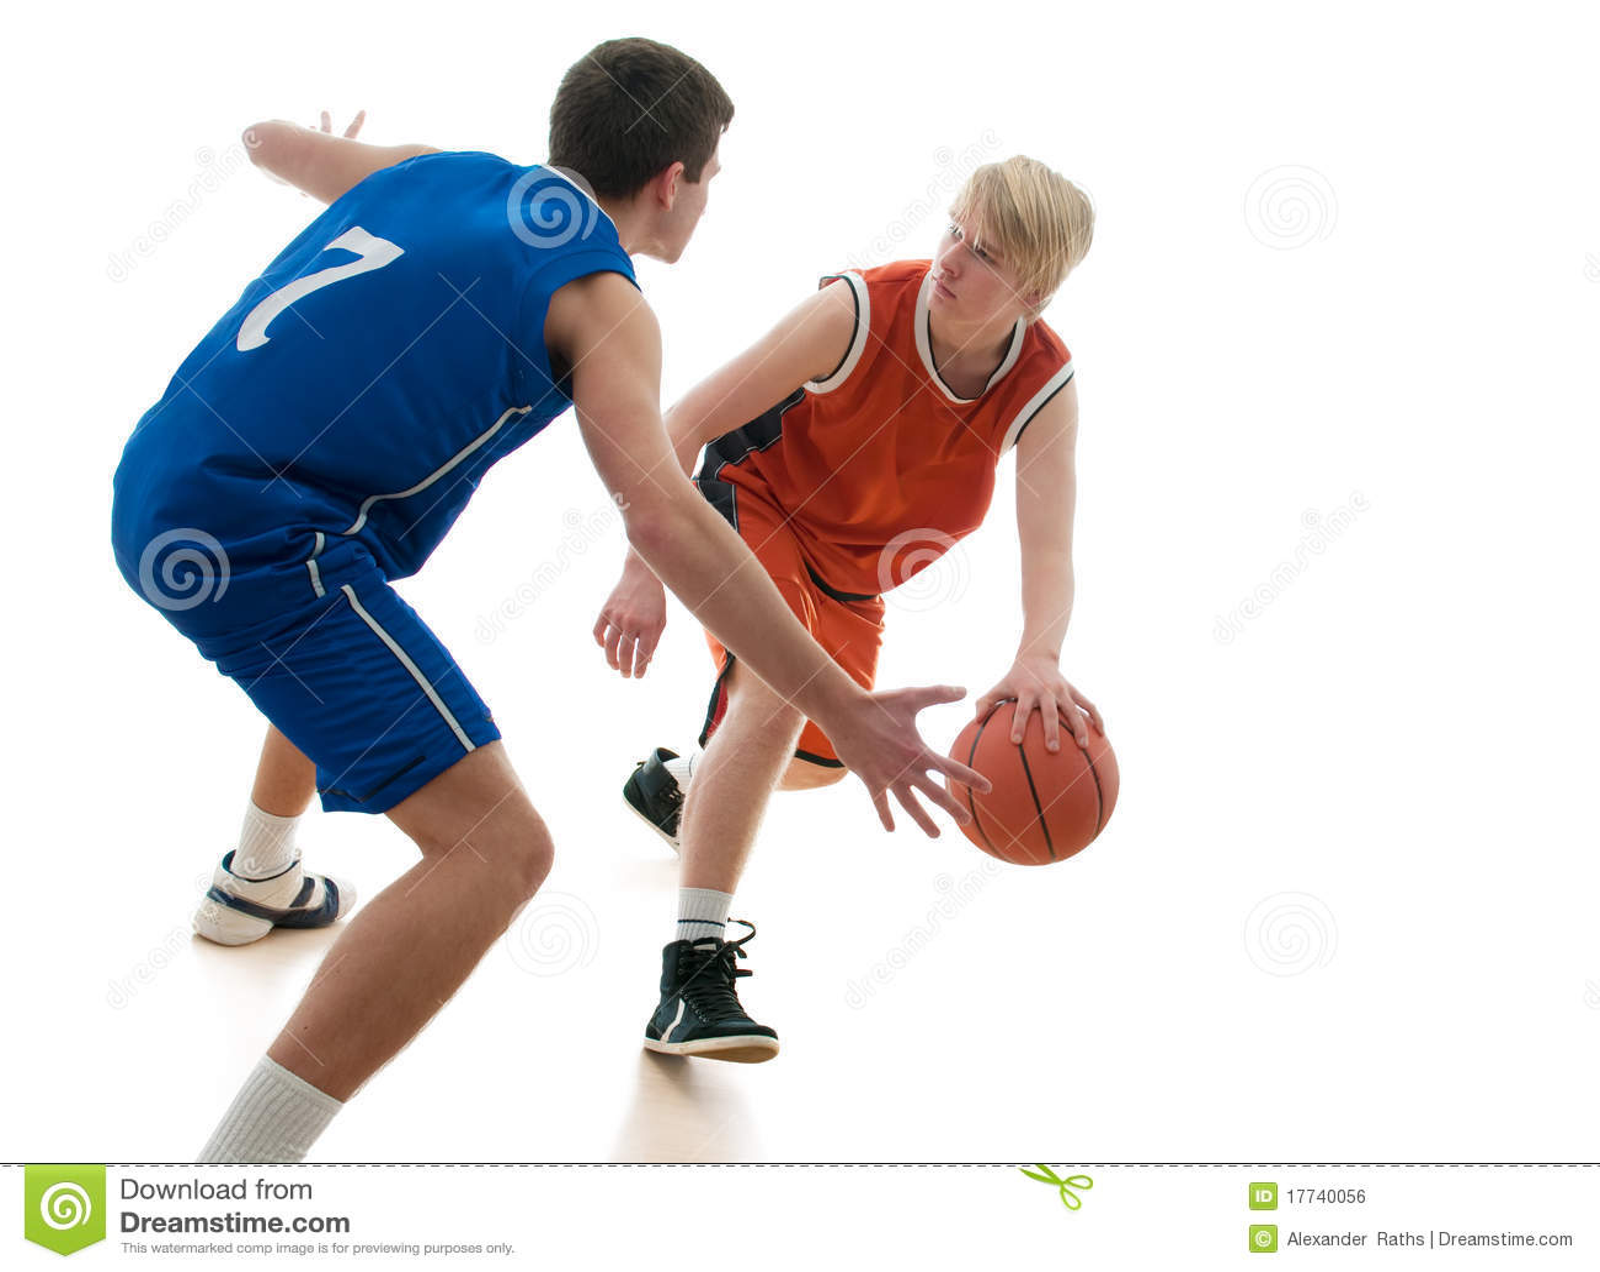 basketball online game mr sportsbook